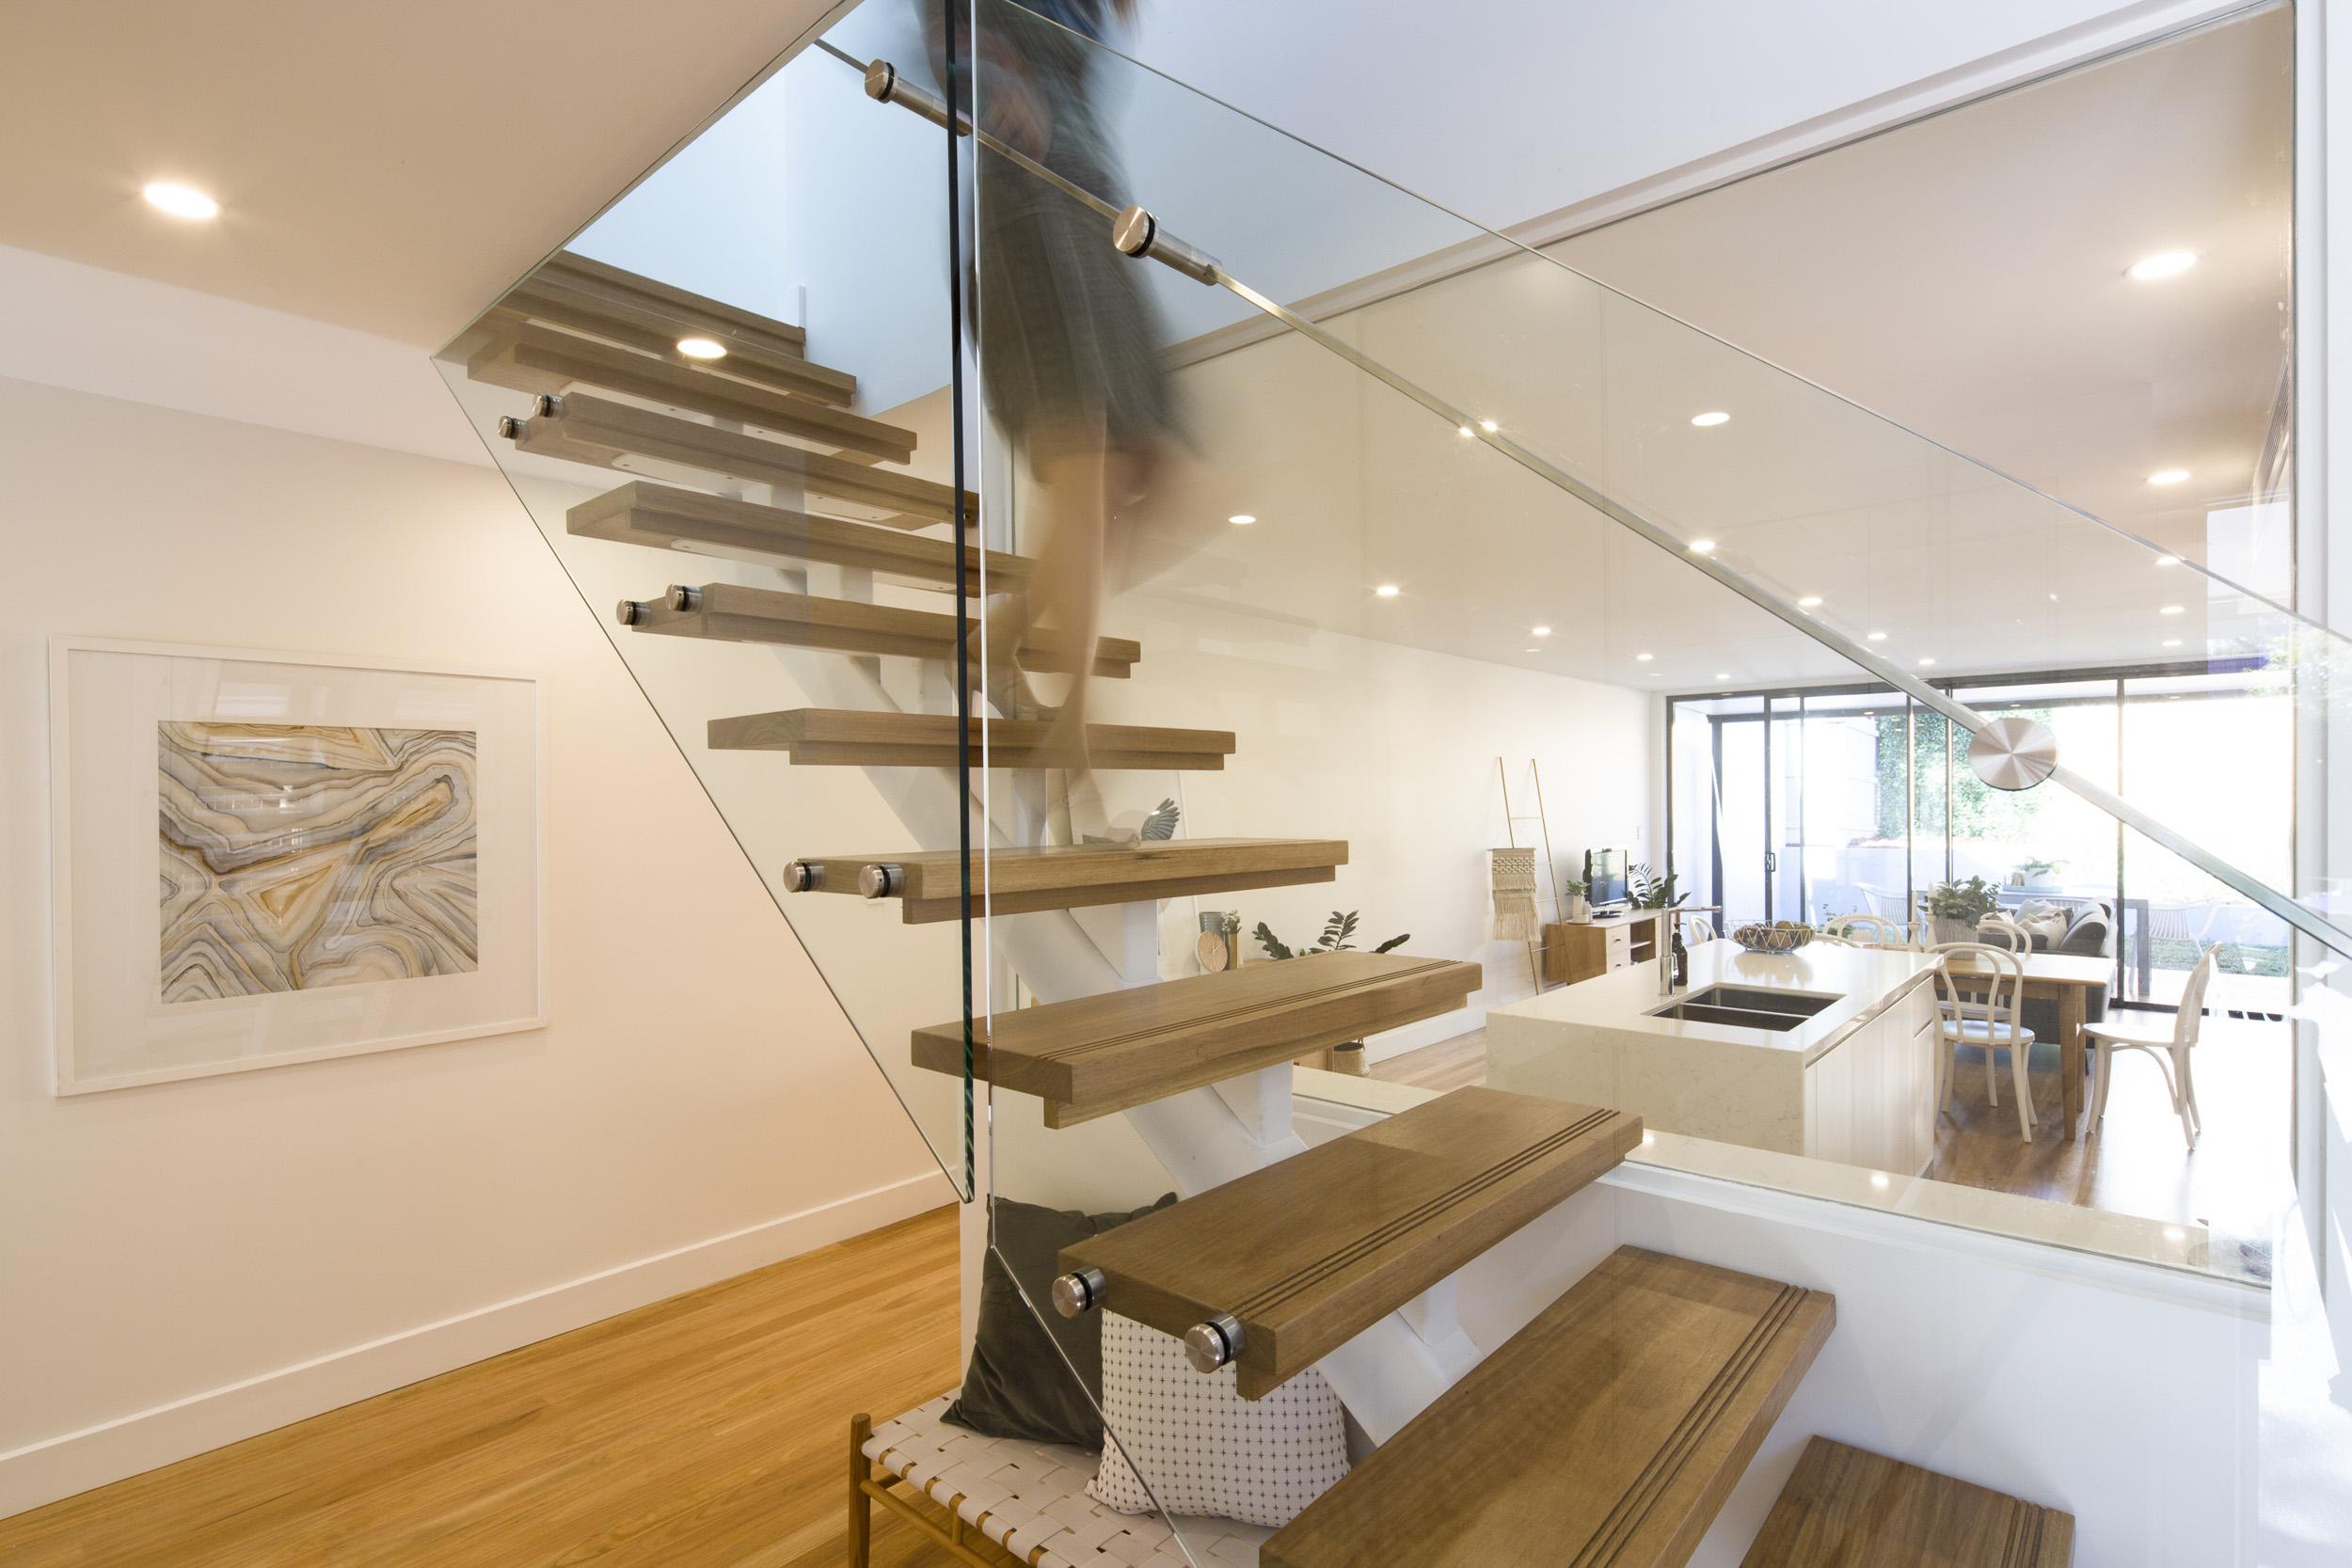 house_photographer_sydney_ns_studio_architects_02.jpg